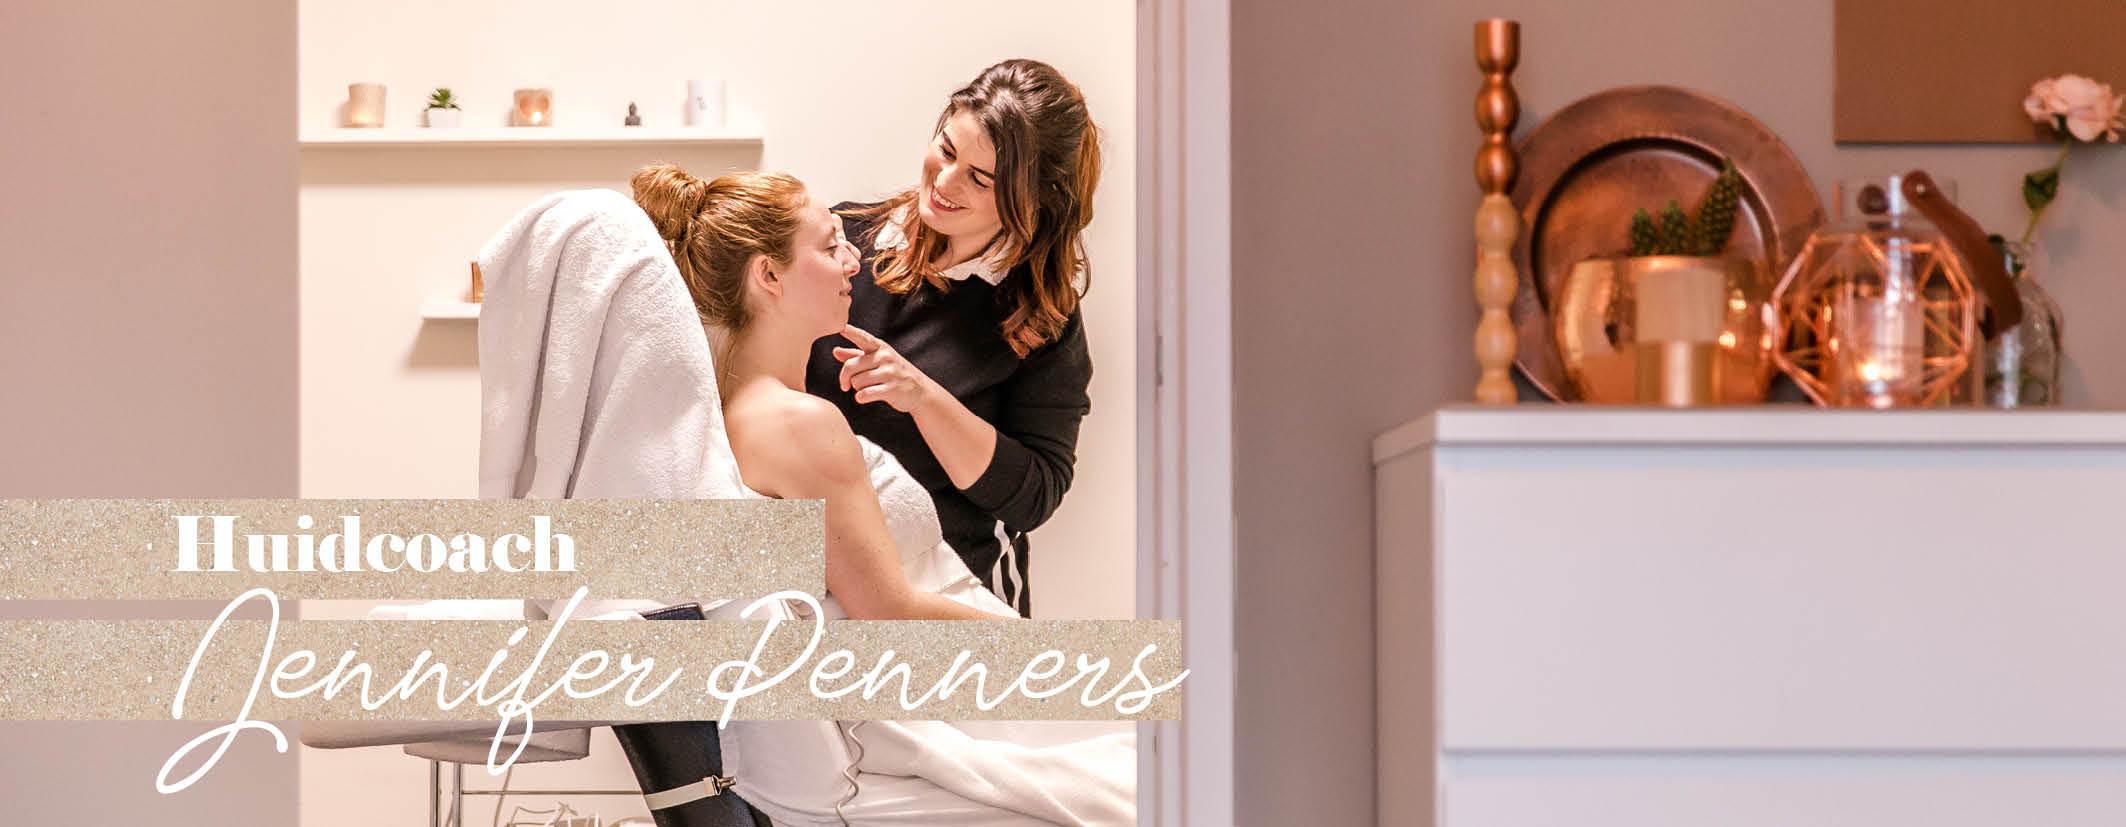 Schoonheidsspecialiste Echt - Jennifer Penners - Skinics